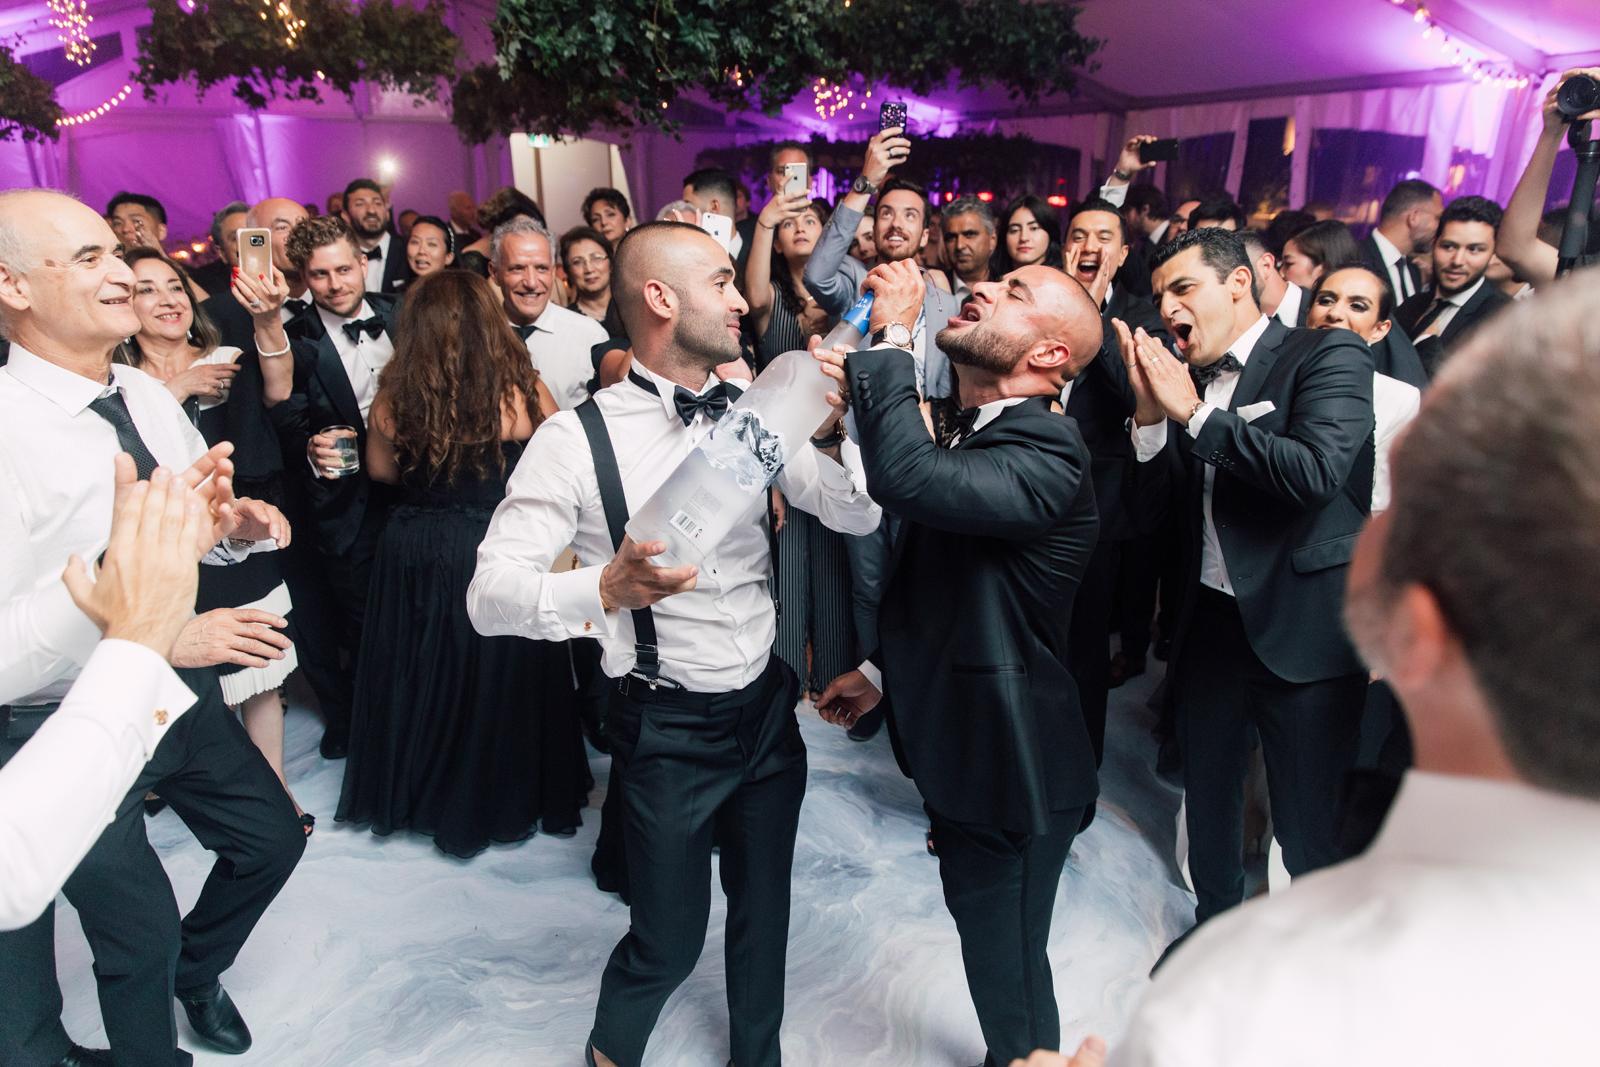 Wedding reception drinking